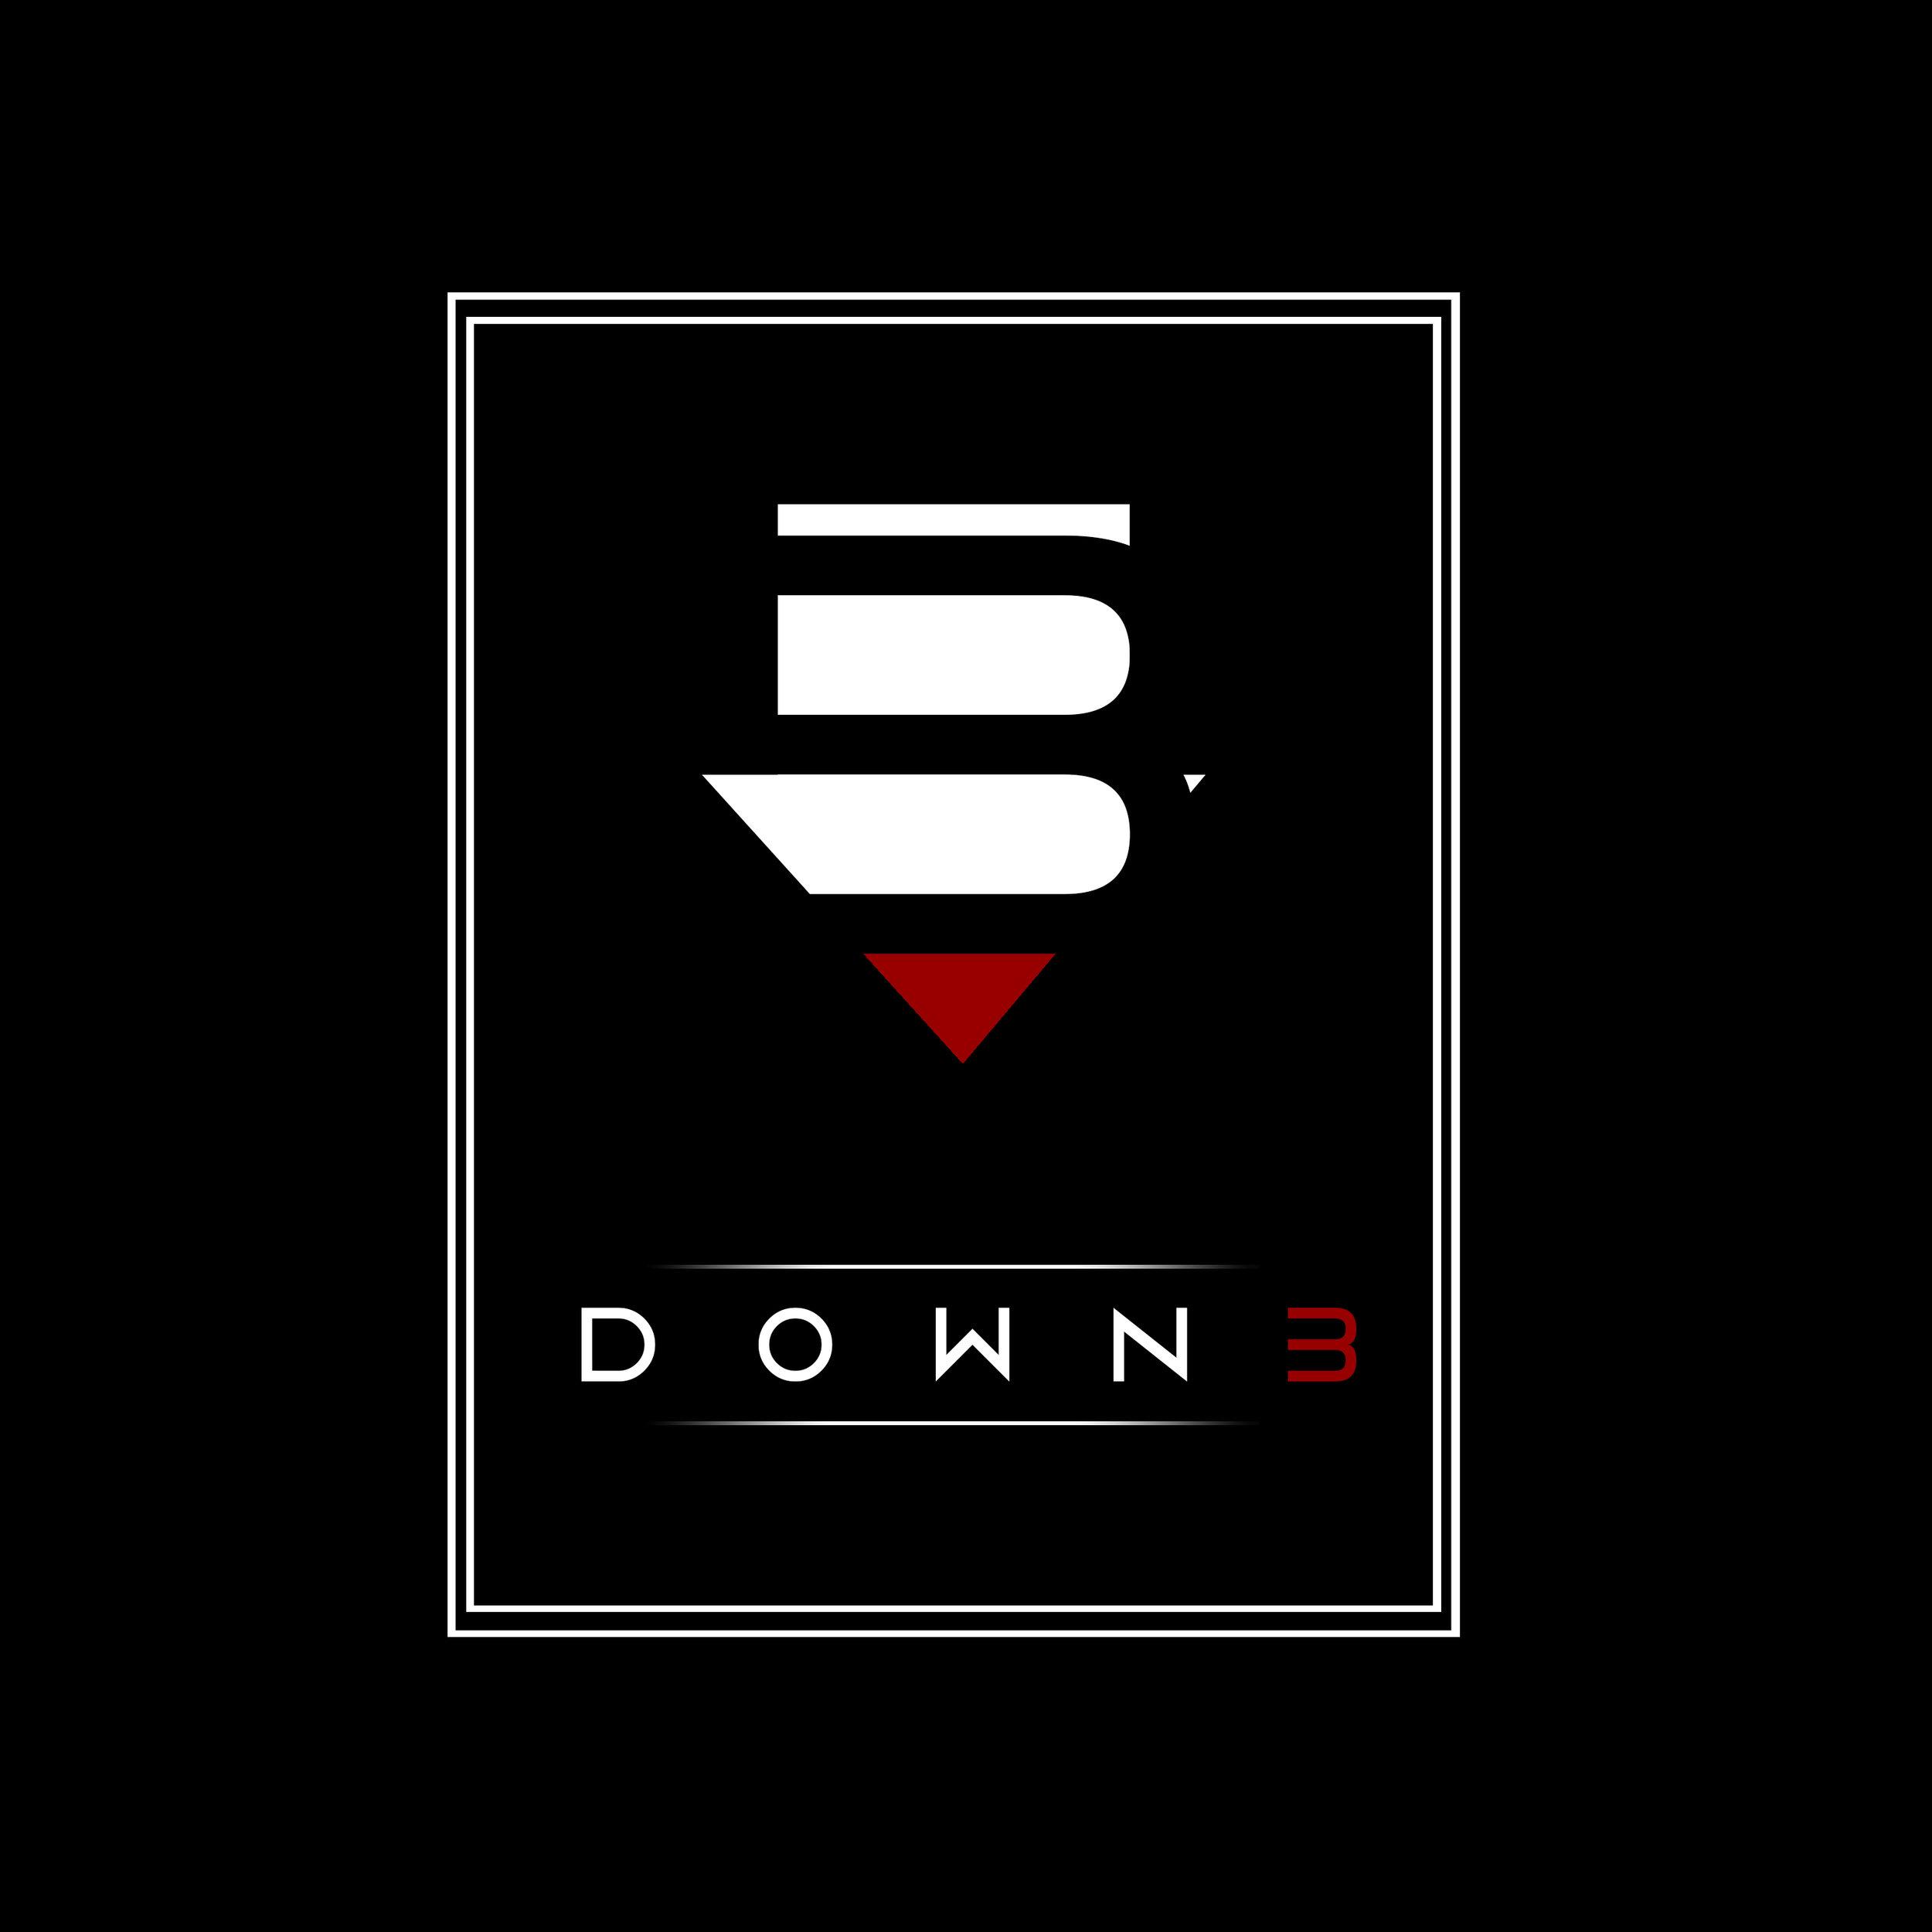 down3 3 .jpg